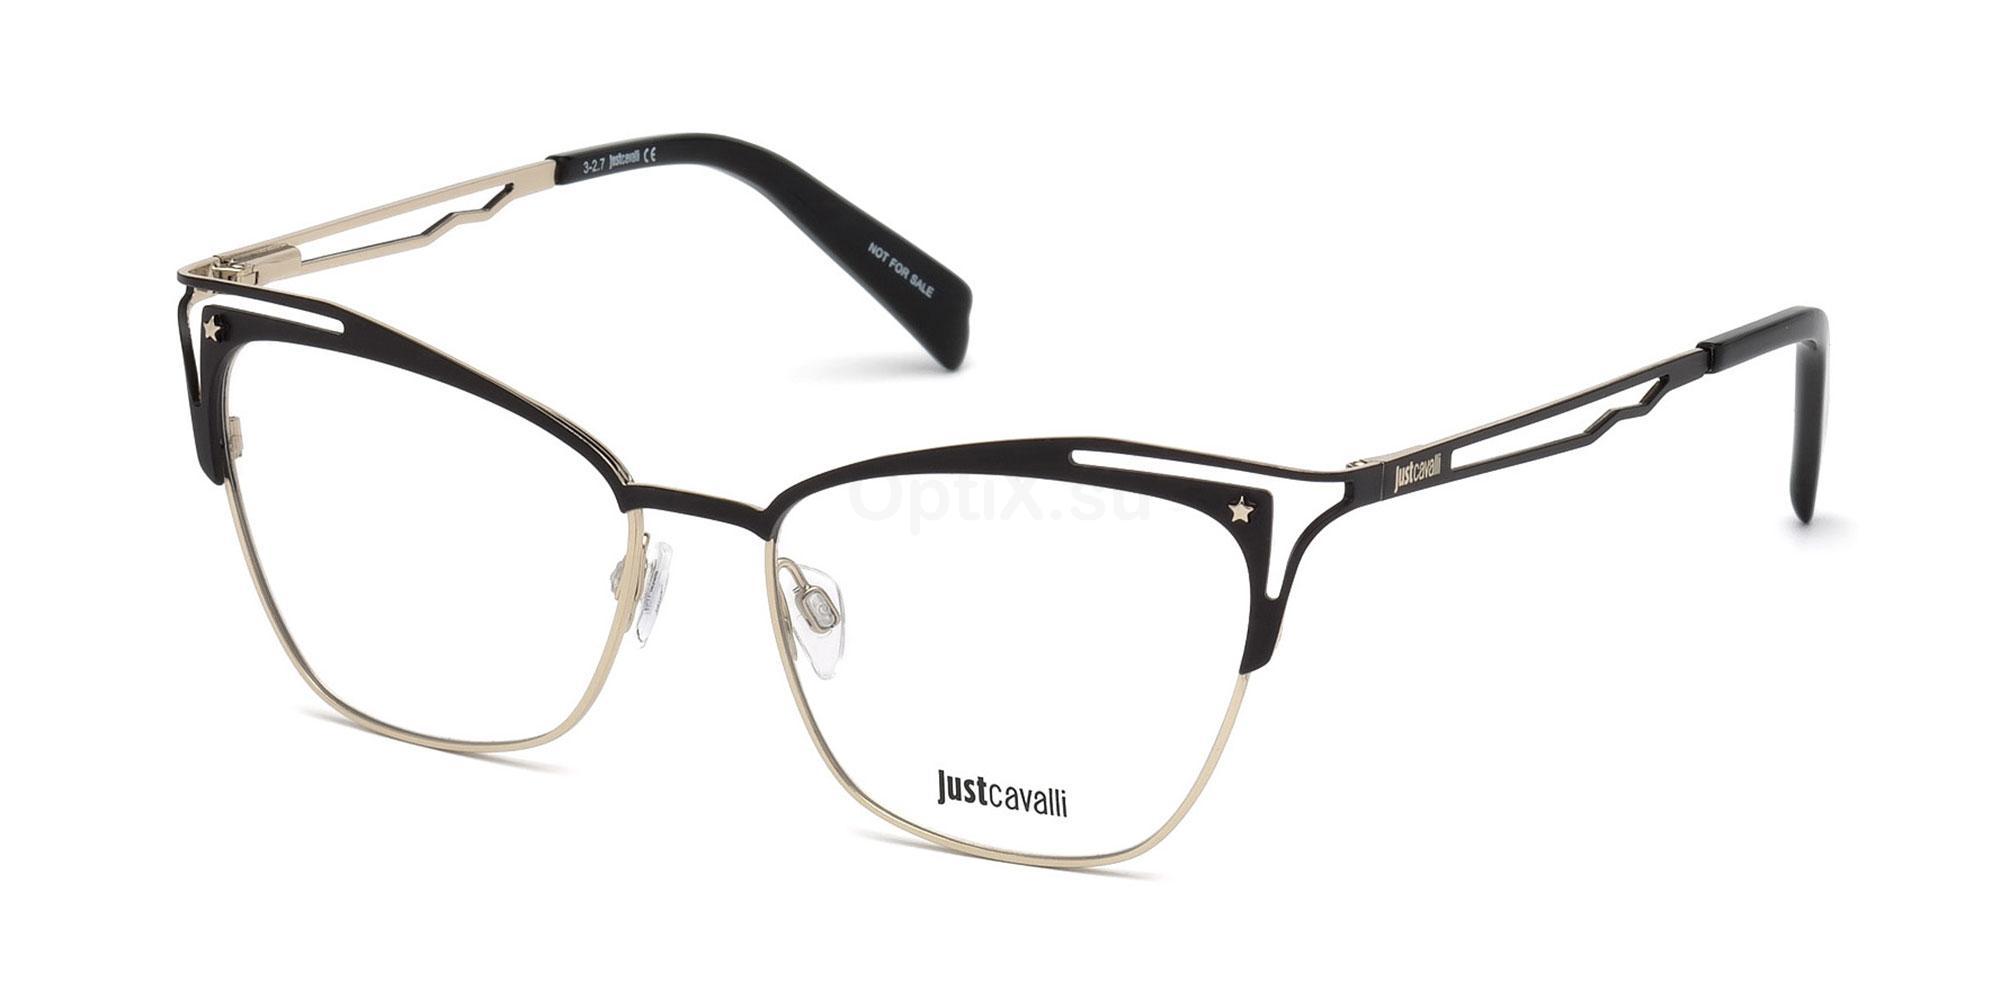 005 JC0859 Glasses, Just Cavalli